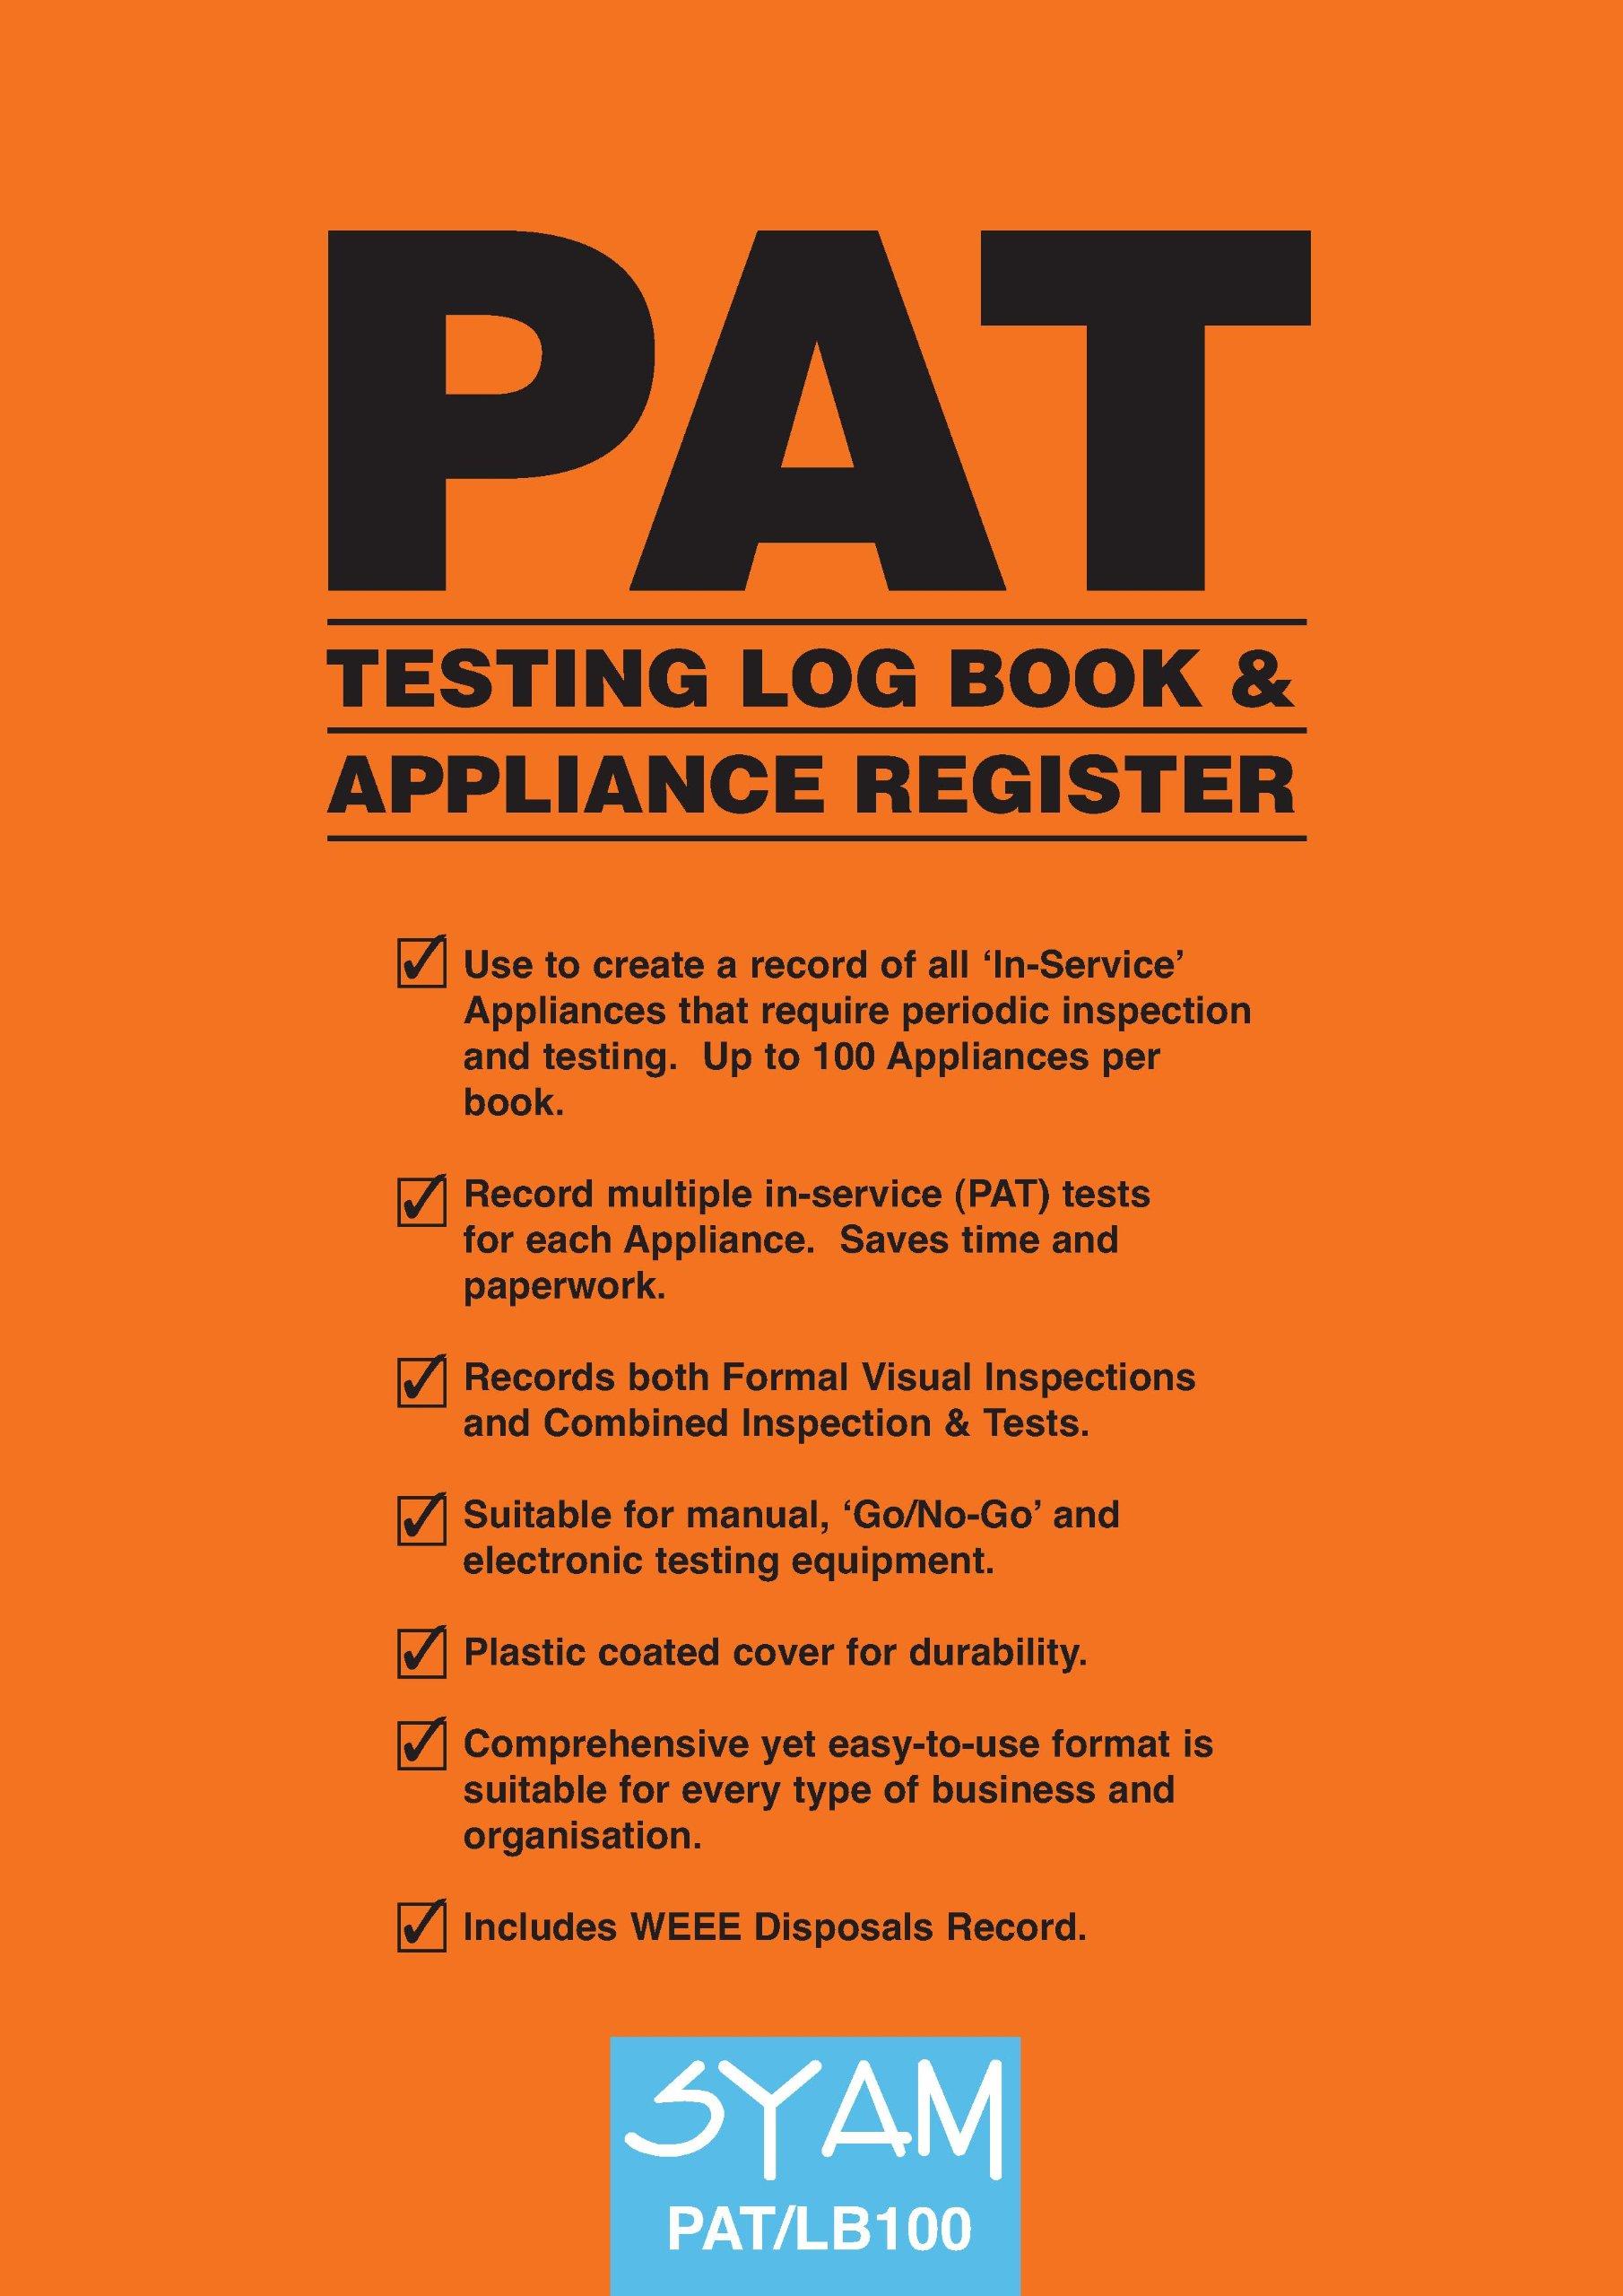 sc 1 st  Amazon UK & PAT TESTING LOG BOOK u0026 APPLIANCE REGISTER: Amazon.co.uk: SYAM: Books azcodes.com